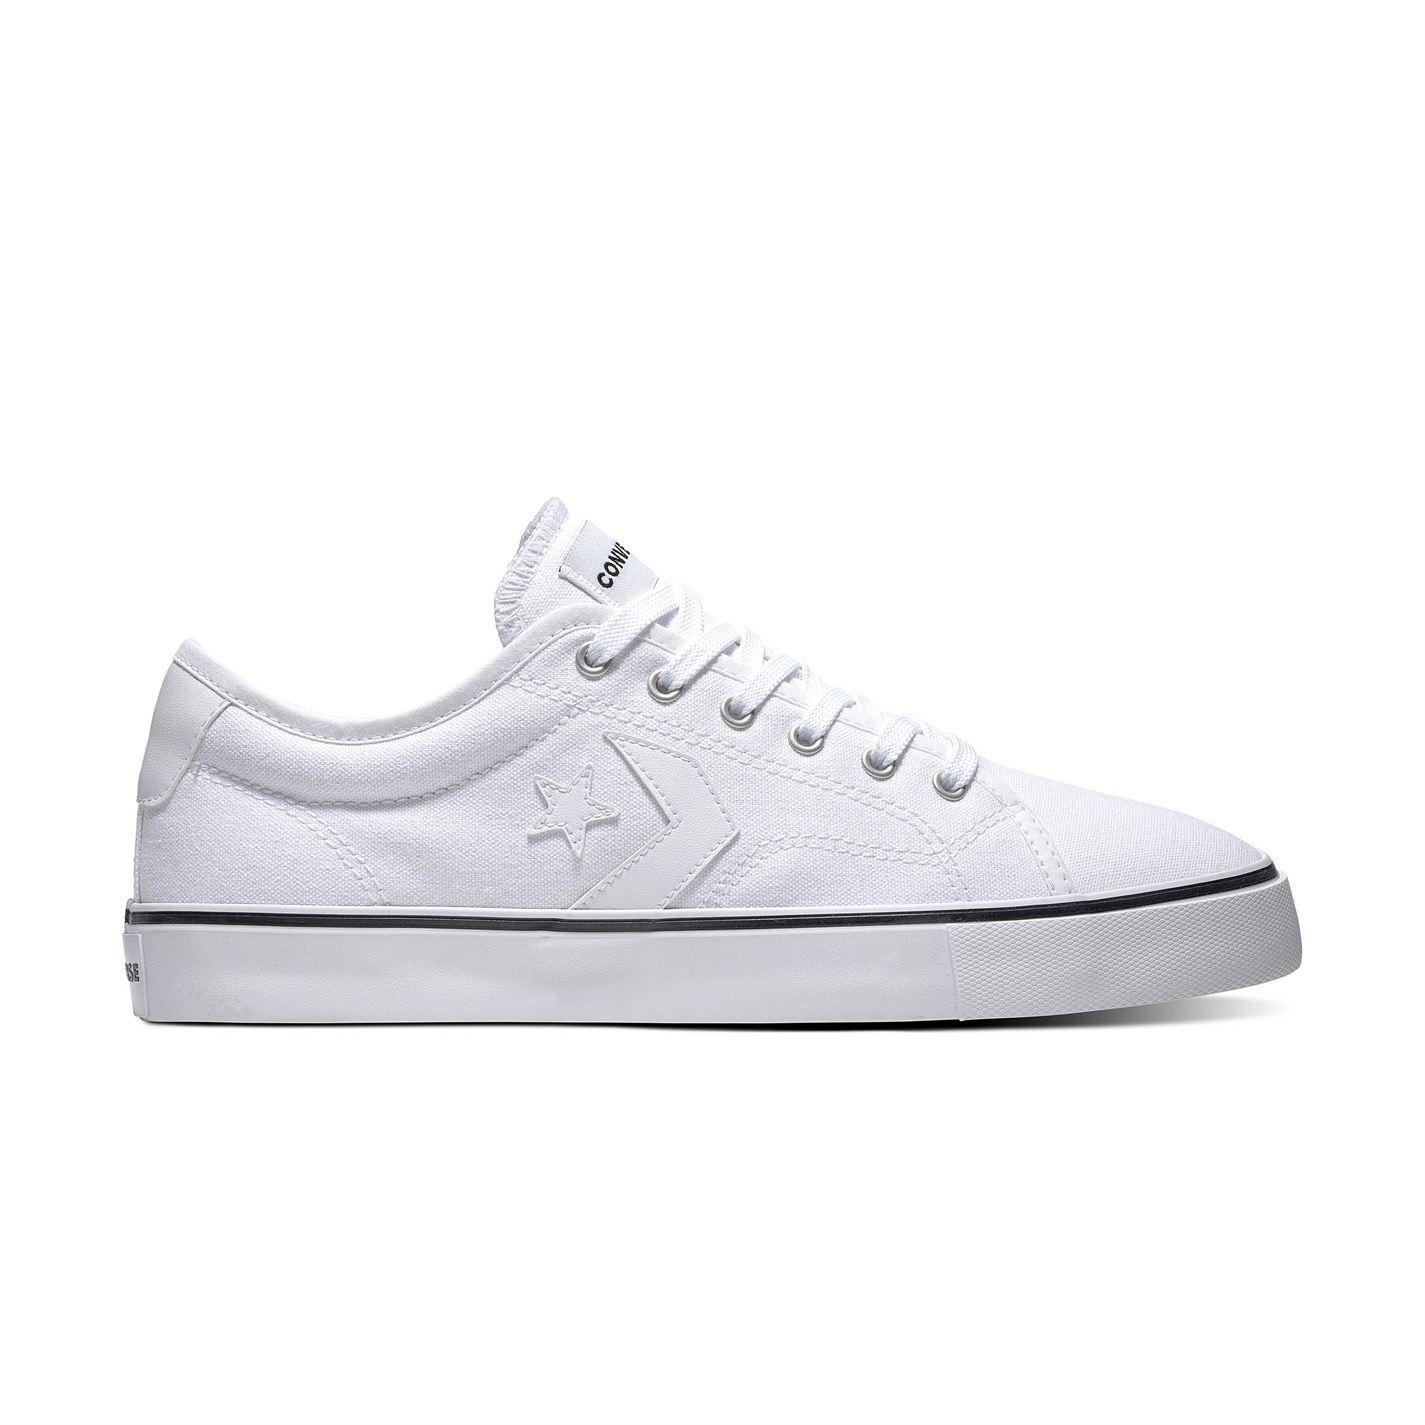 Converse-Ox-REPLAY-Baskets-Pour-Homme-Chaussures-De-Loisirs-Chaussures-Baskets miniature 30